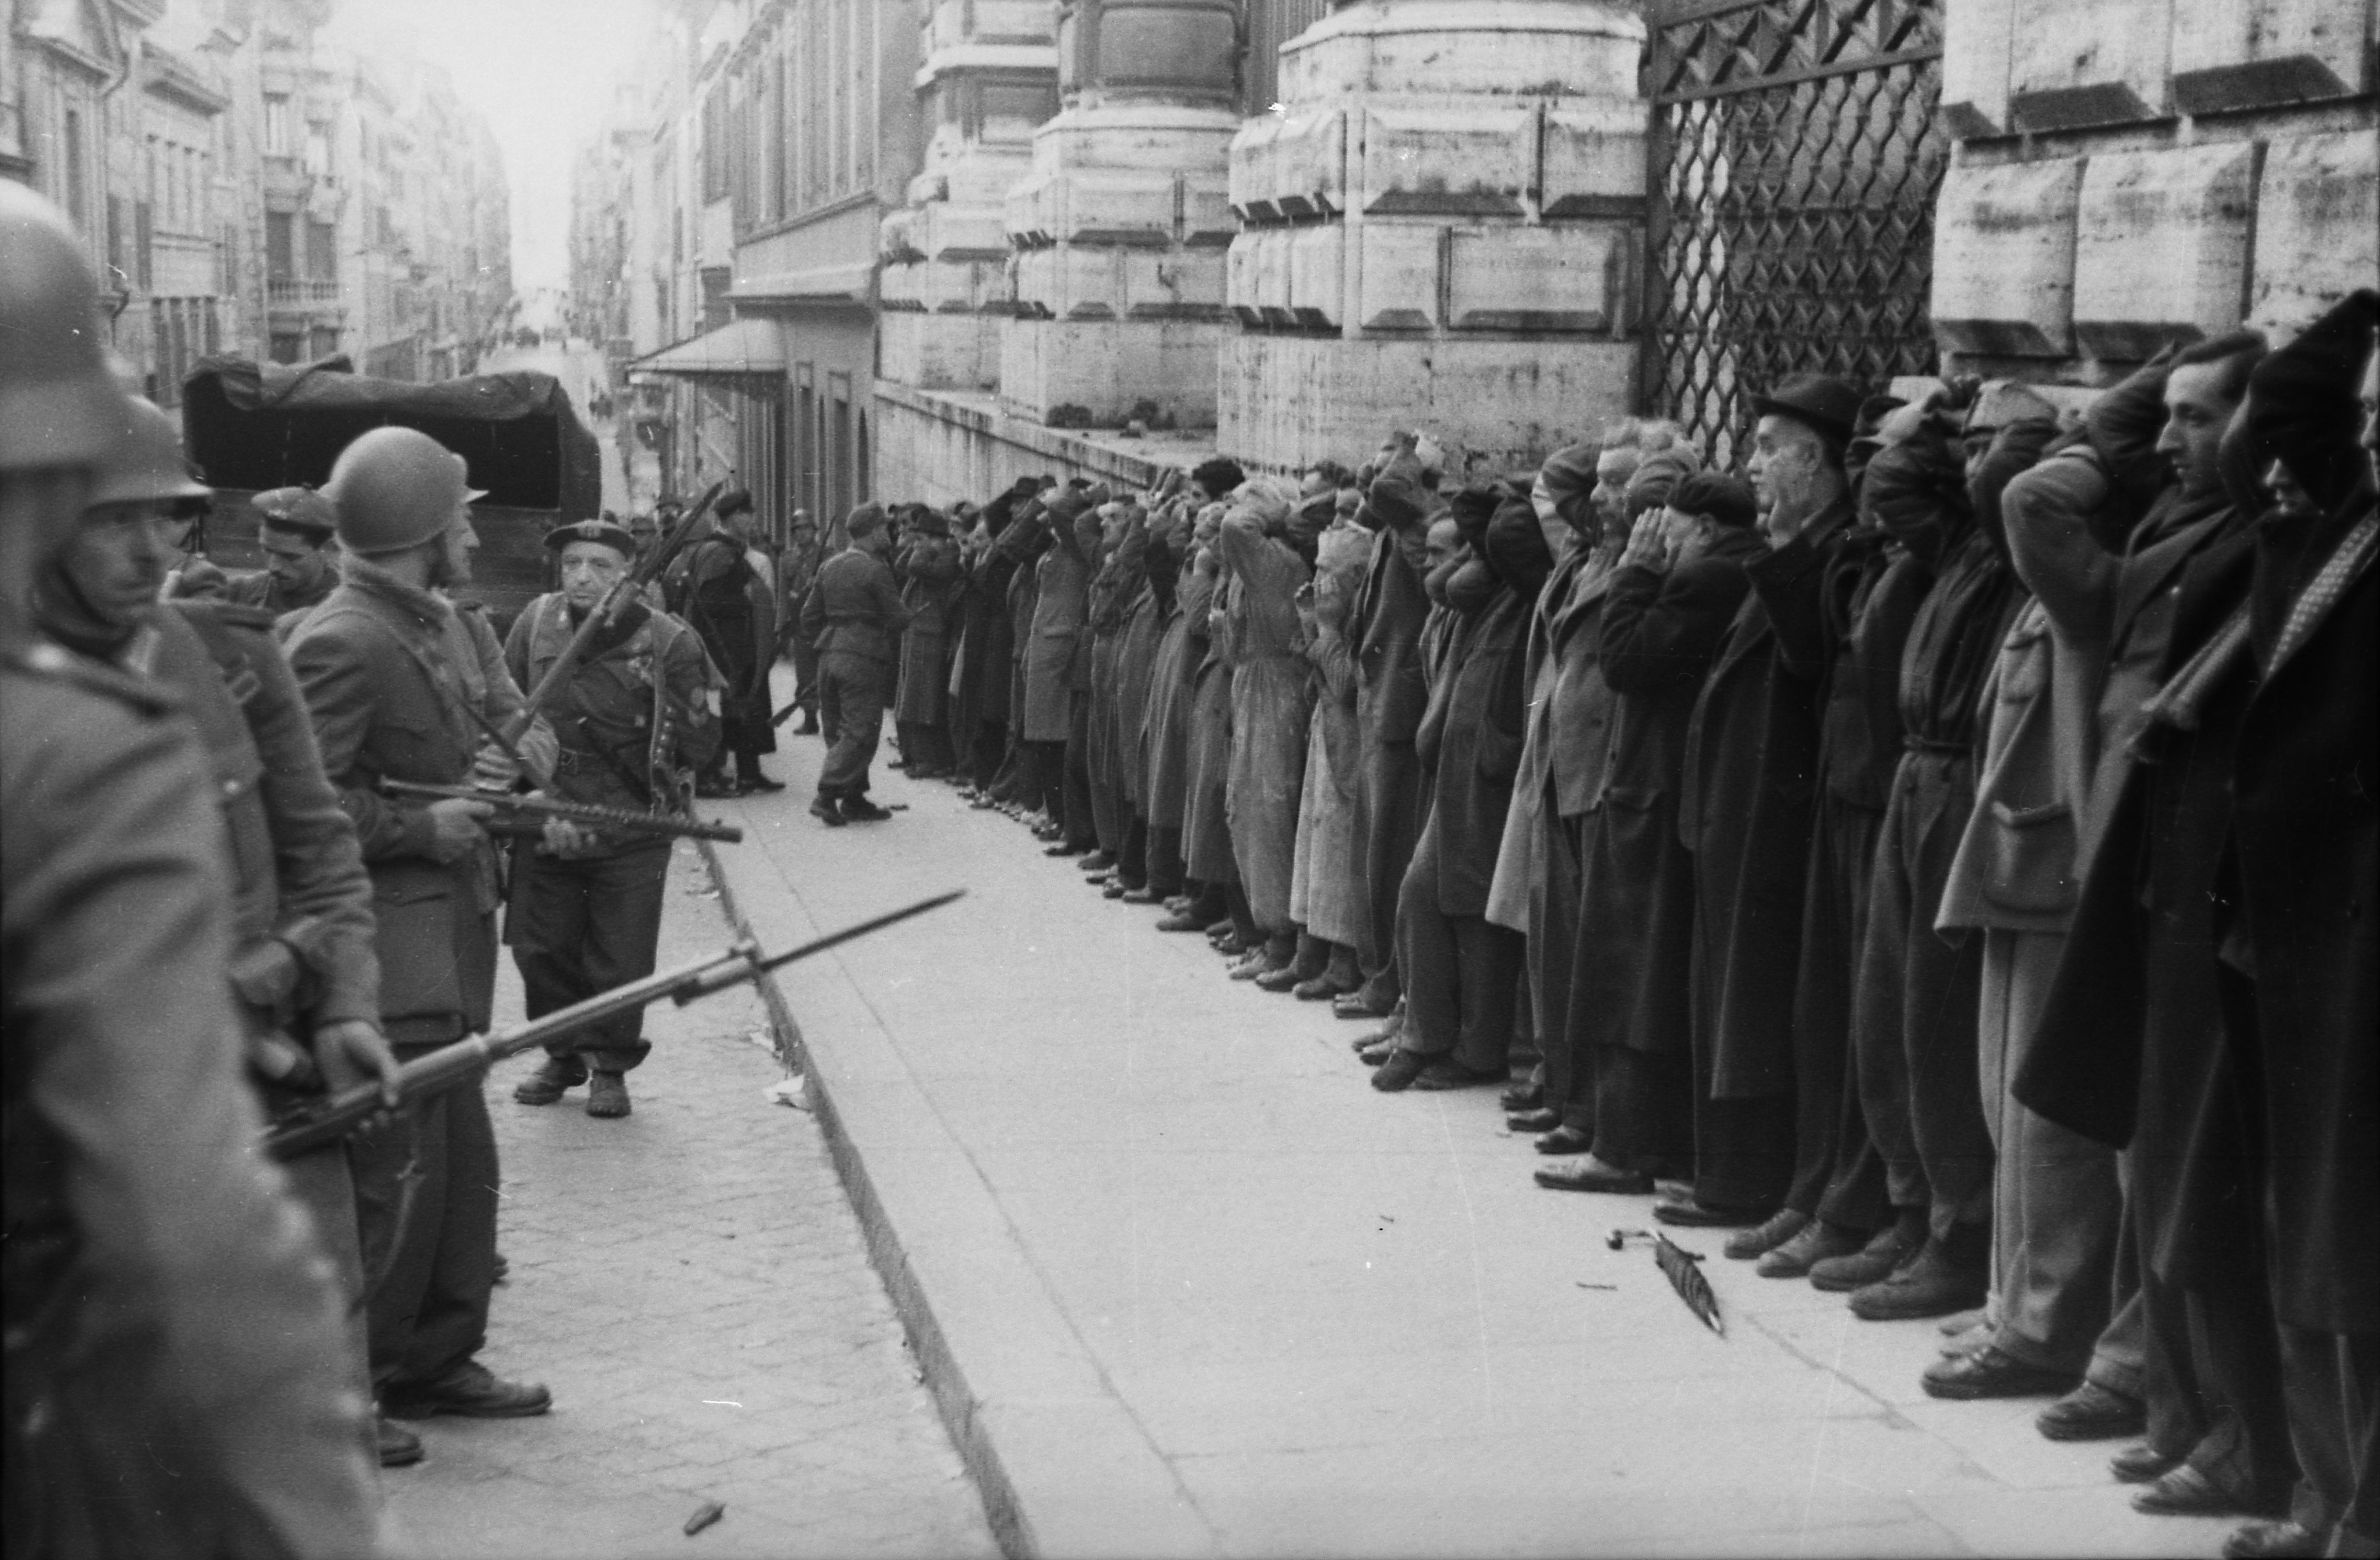 File:Bundesarchiv Bild 101I-312-0983-03, Rom, Festnahme von Zivilisten.jpg